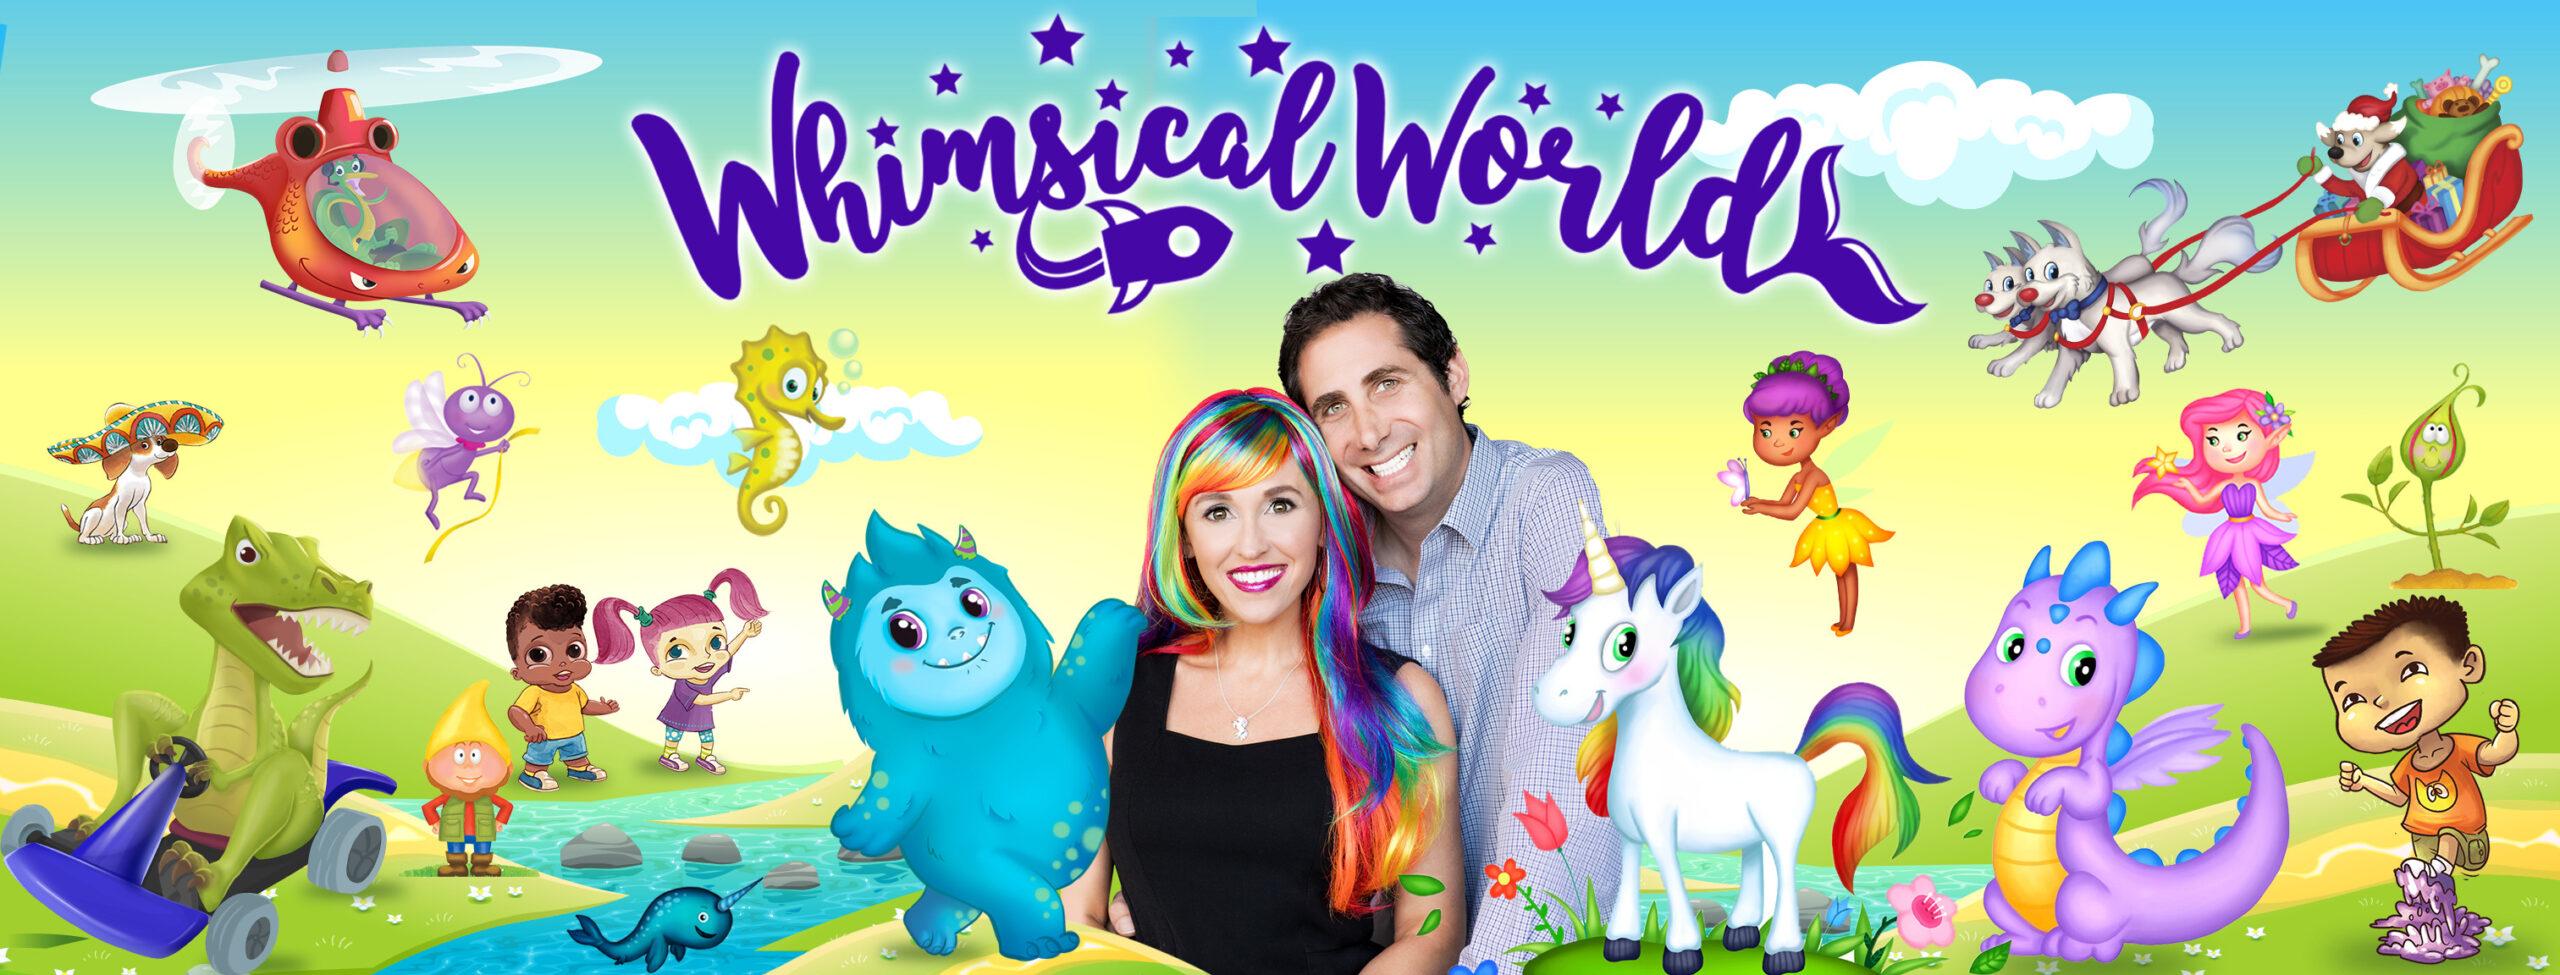 Whimsical World Books by Sheri Fink and Derek Taylor Kent